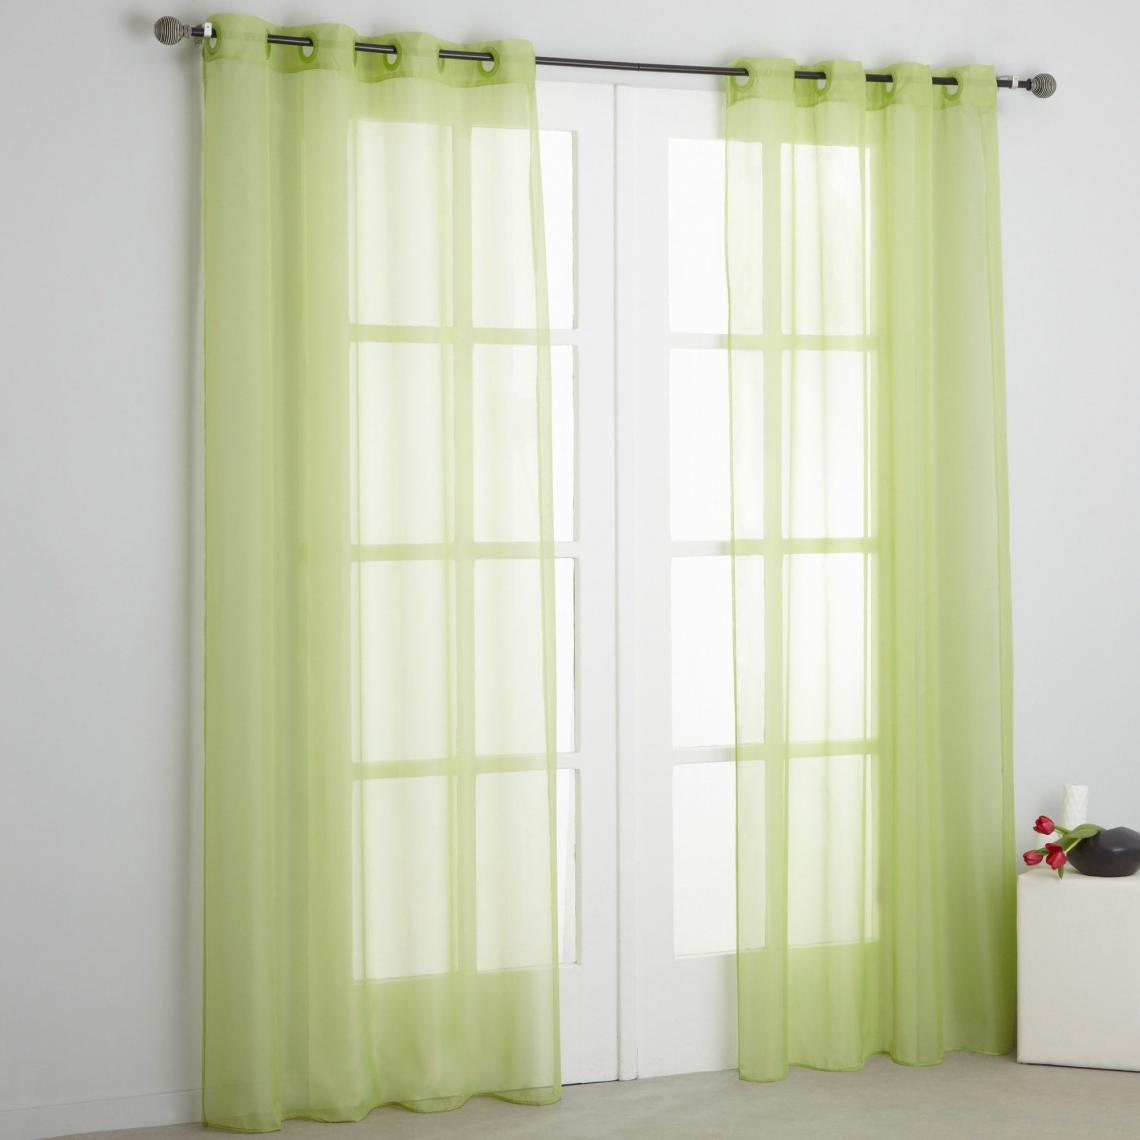 voilage a œillets polyester vert